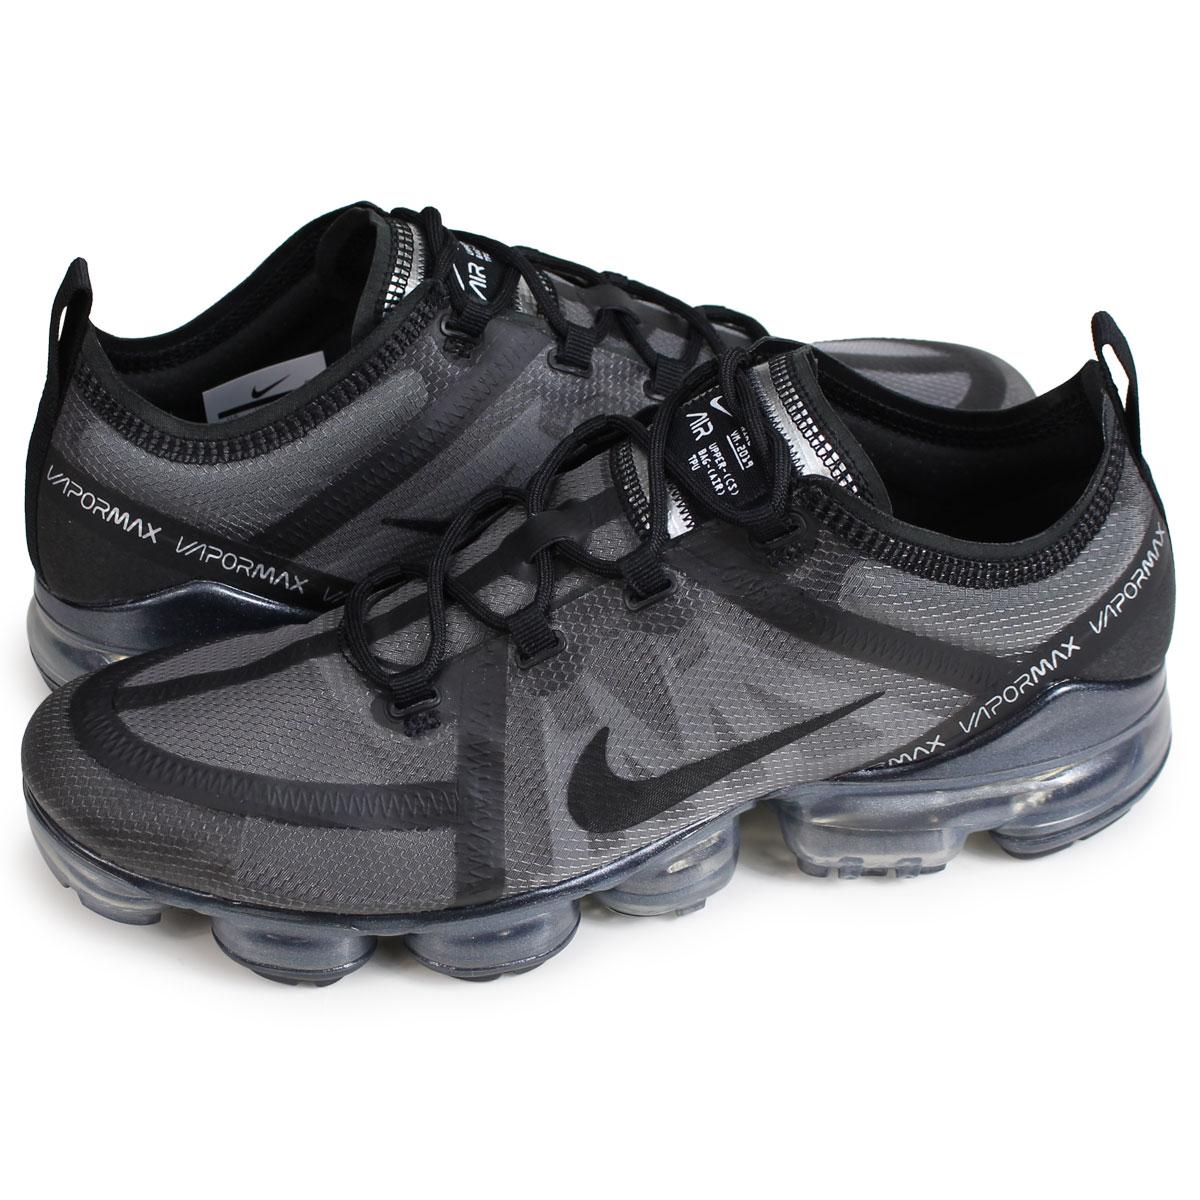 designer fashion 3a264 25165 Nike NIKE air vapor max 2019 sneakers men AIR VAPORMAX 2019 black  AR6631-004 [1/30 Shinnyu load]